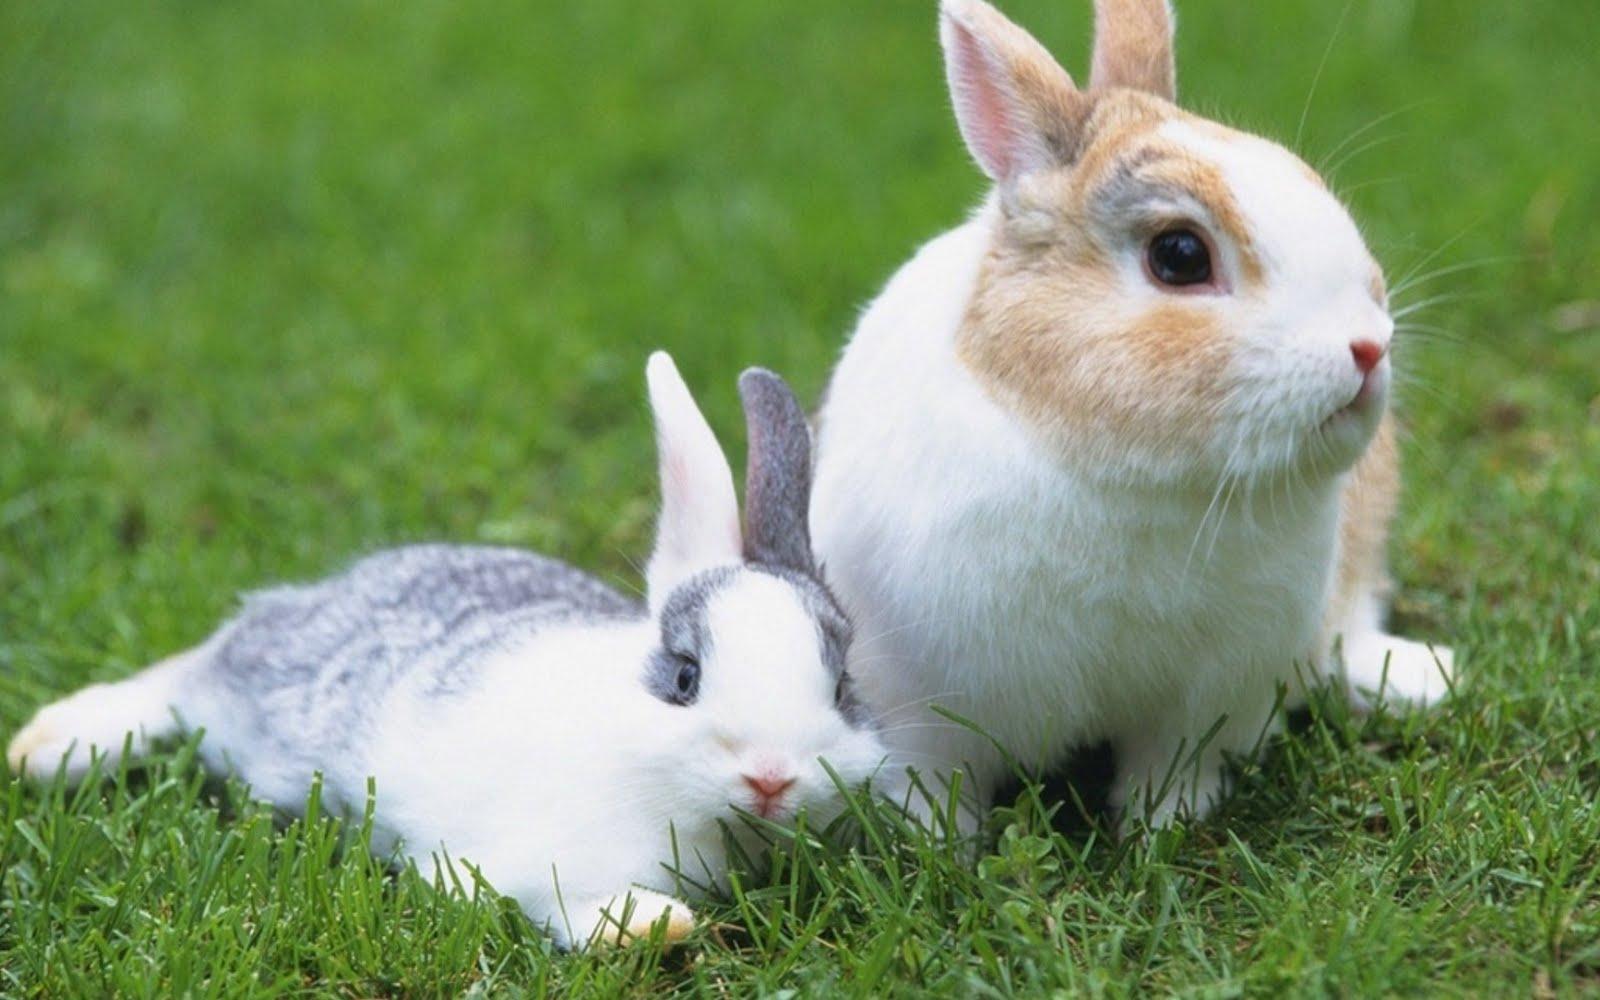 http://2.bp.blogspot.com/-KmX7DRuyoBE/TahWWujWryI/AAAAAAAACm4/F1aBJA5PnXg/s1600/Rabbit+%25284%2529.jpg